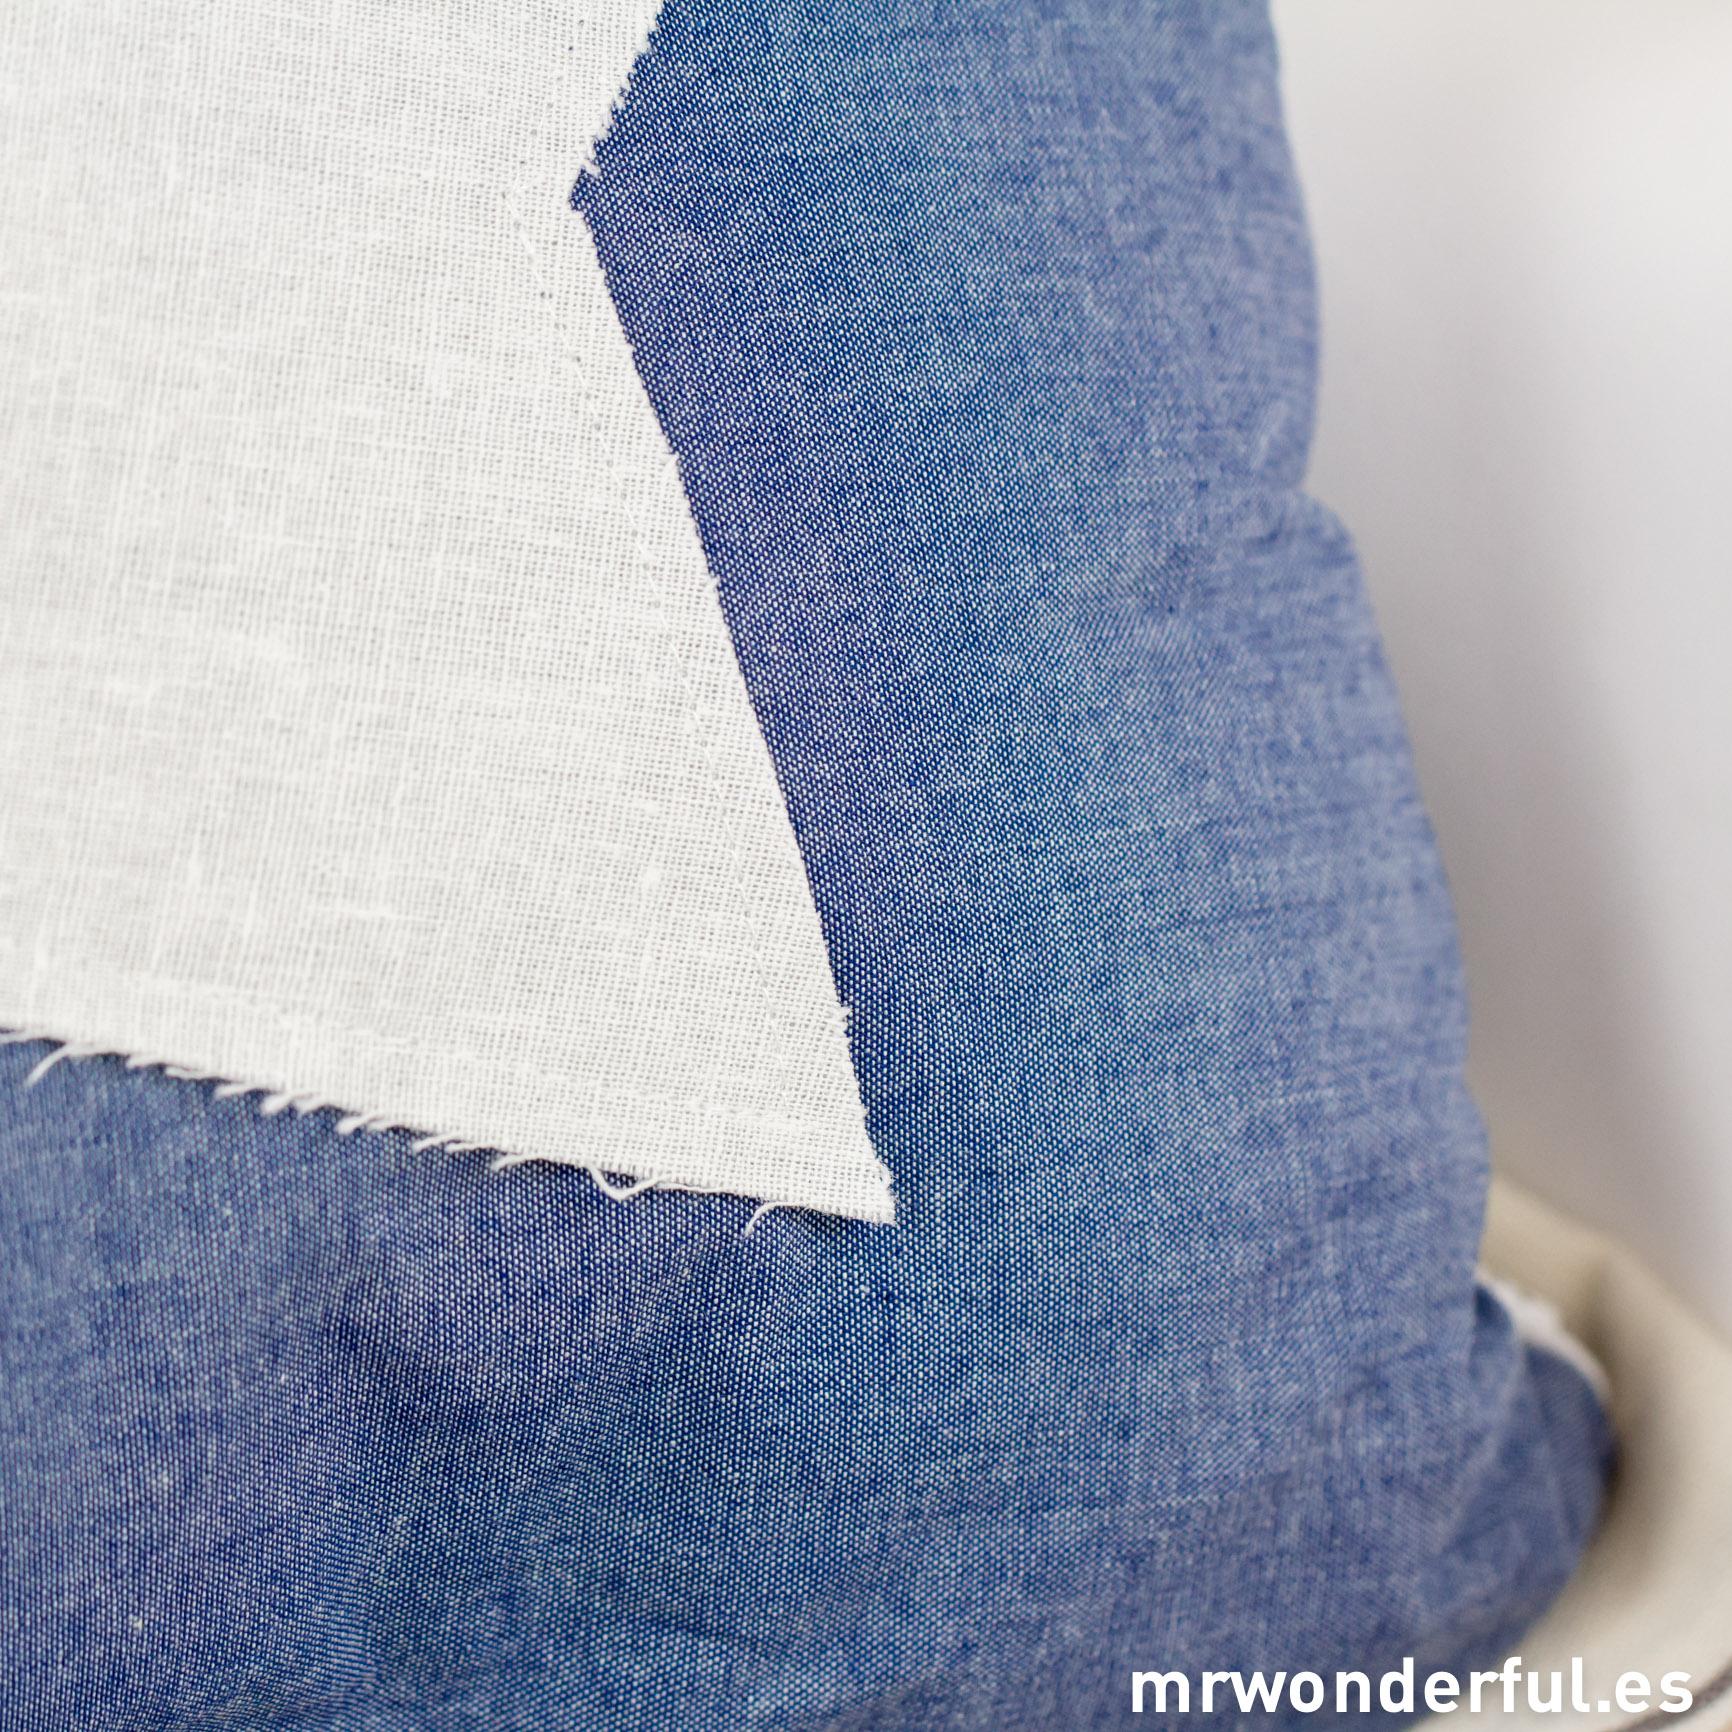 mrwonderful_52957B_cojin-cuadrado-azul-estrella-blanca-14